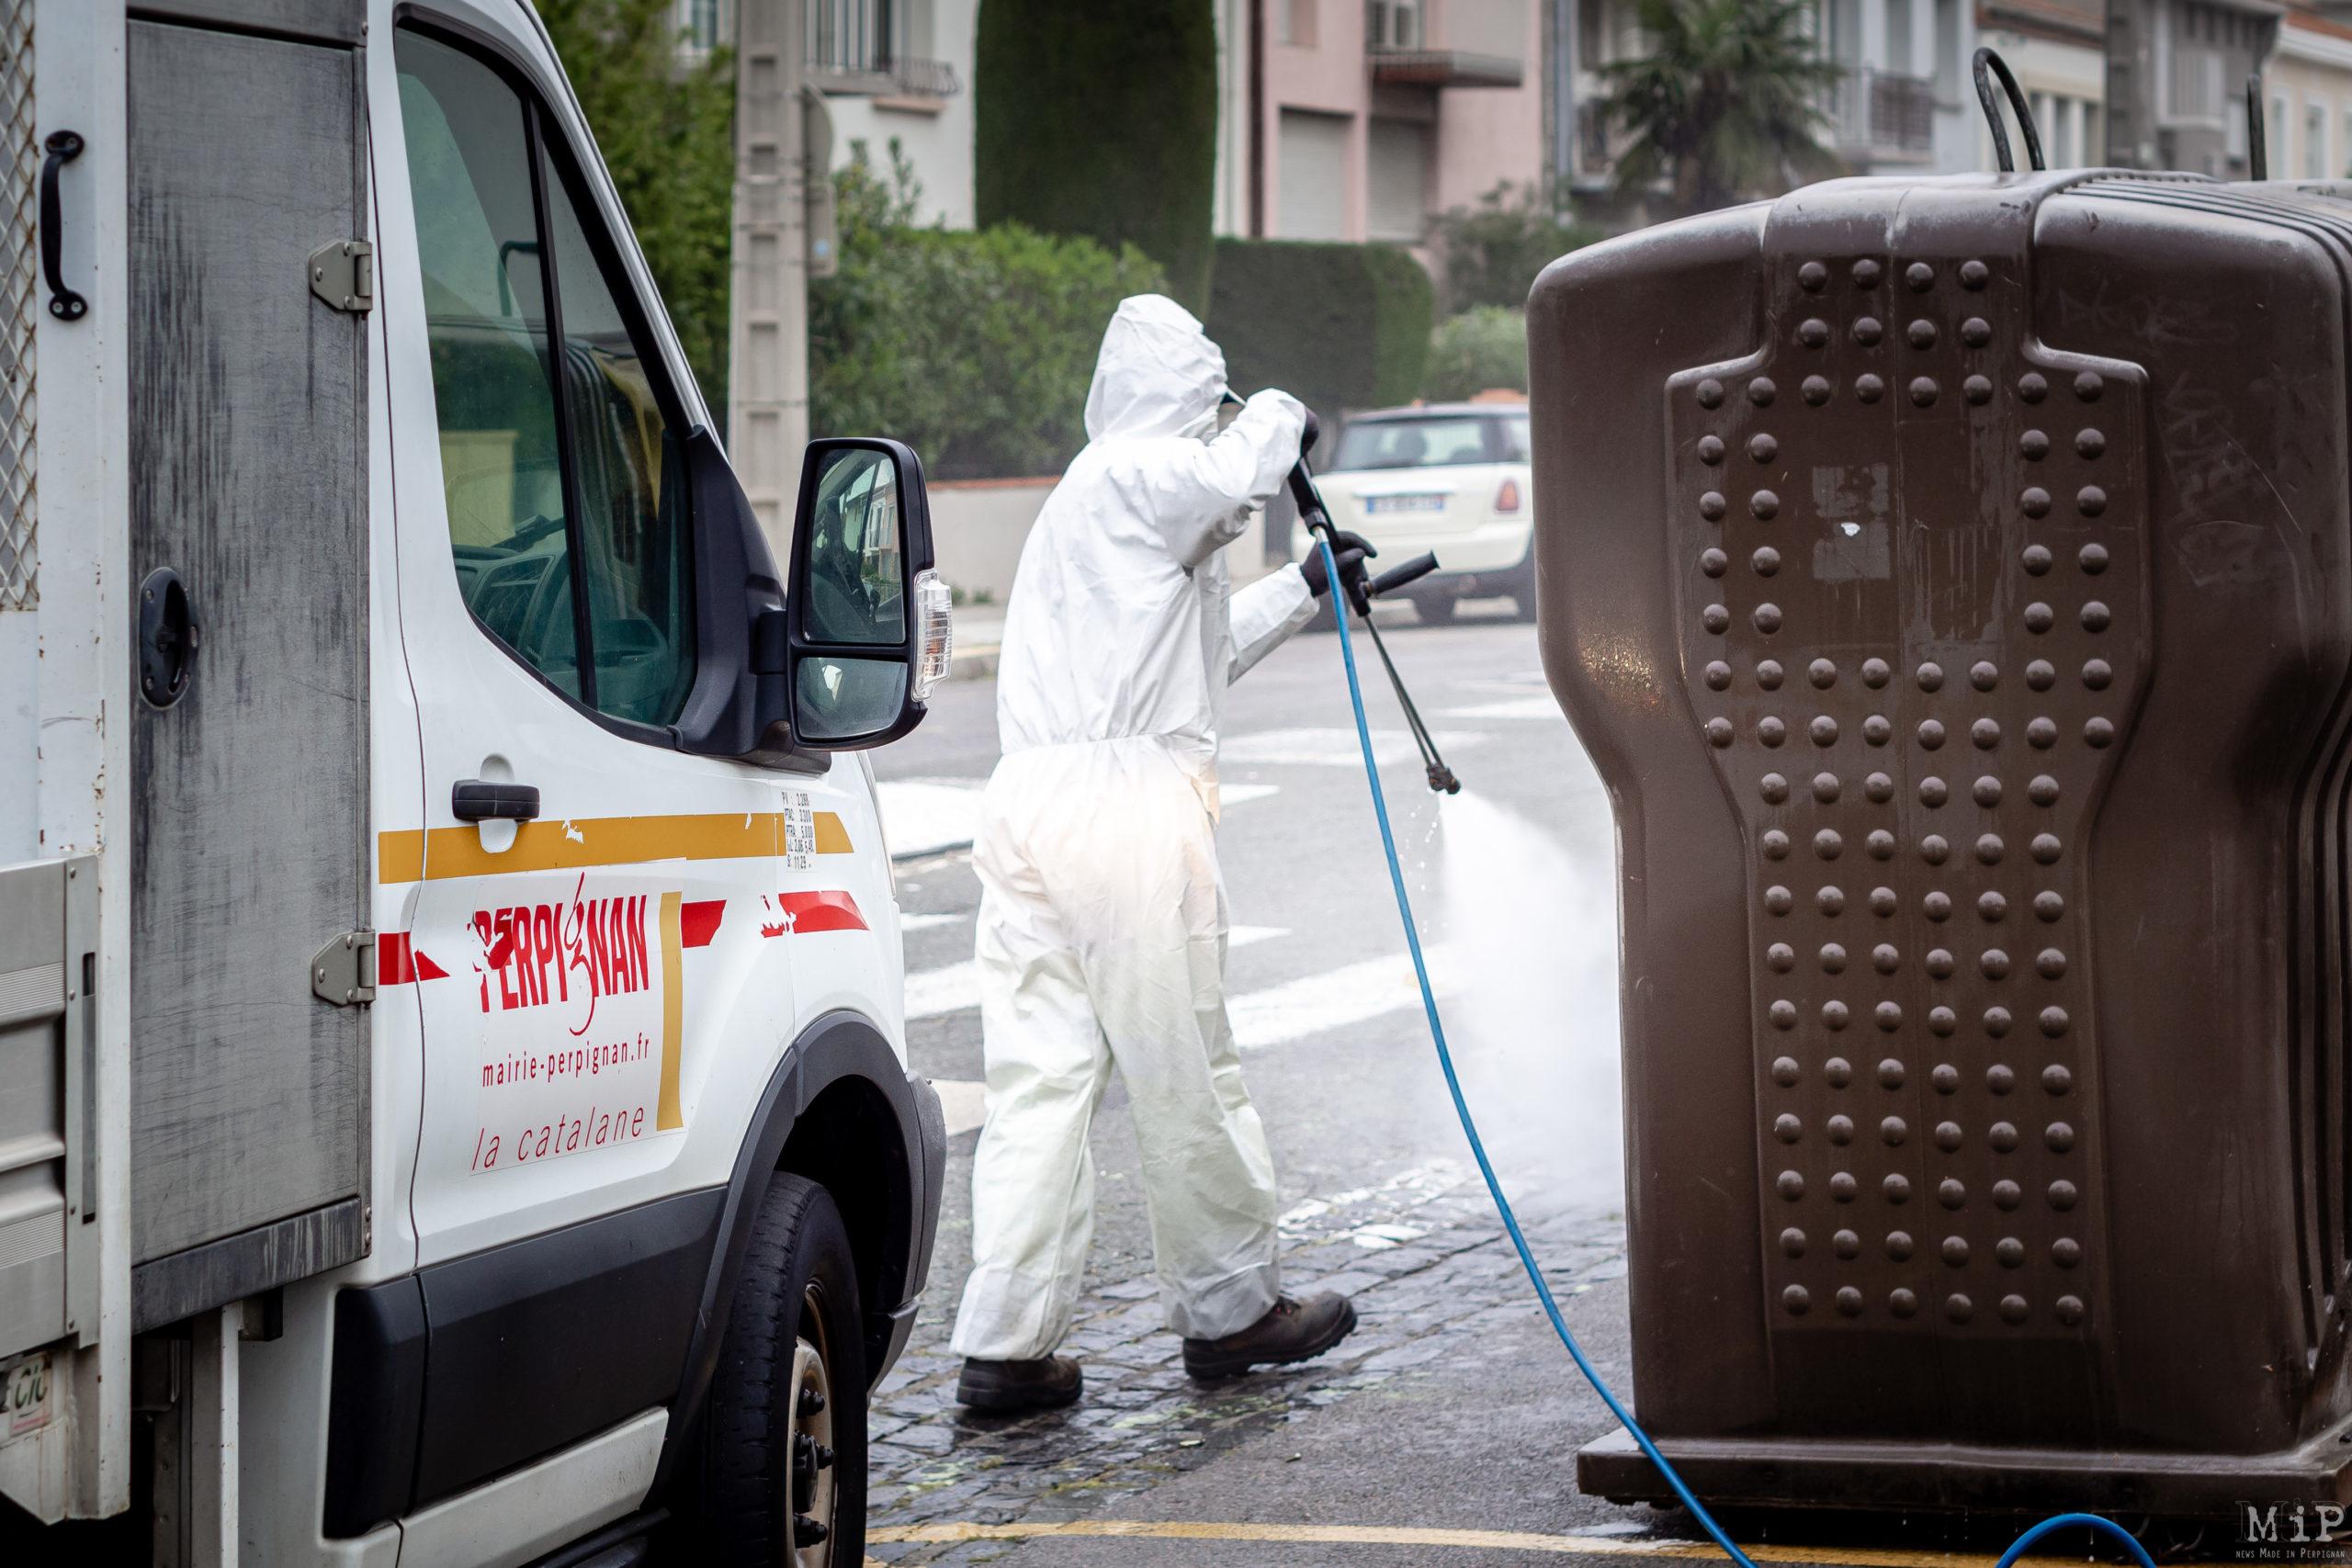 Illustration Perpignan France 10-04-2020 Nettoyage désinfection rue Coronavirus © Arnaud Le Vu / MiP